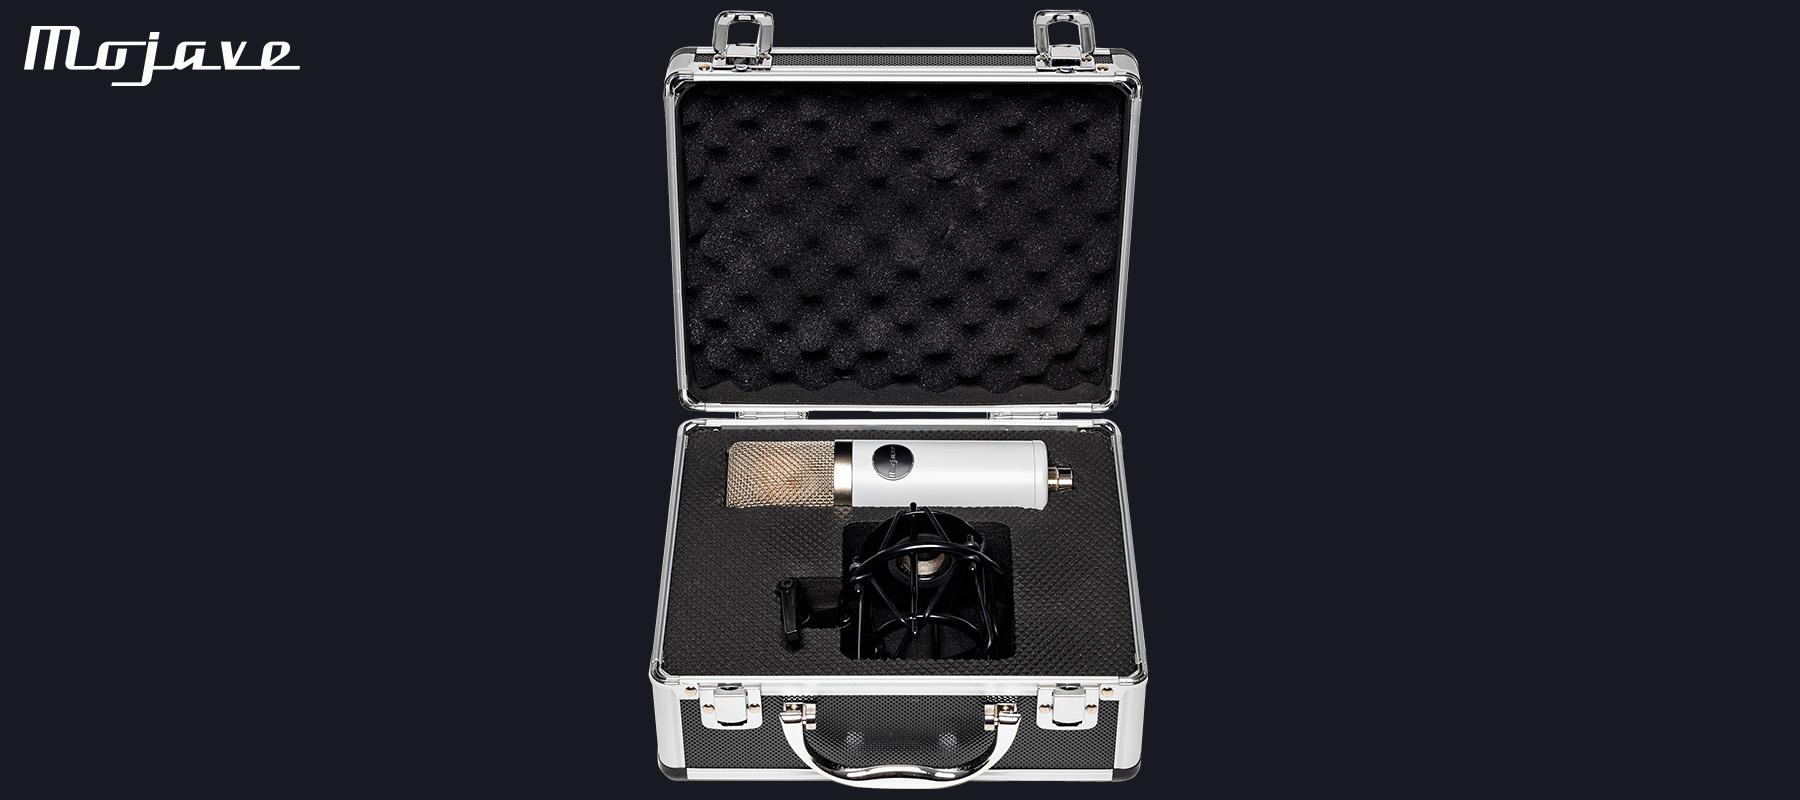 Mojave Audio MA-201fetVG - Transport case